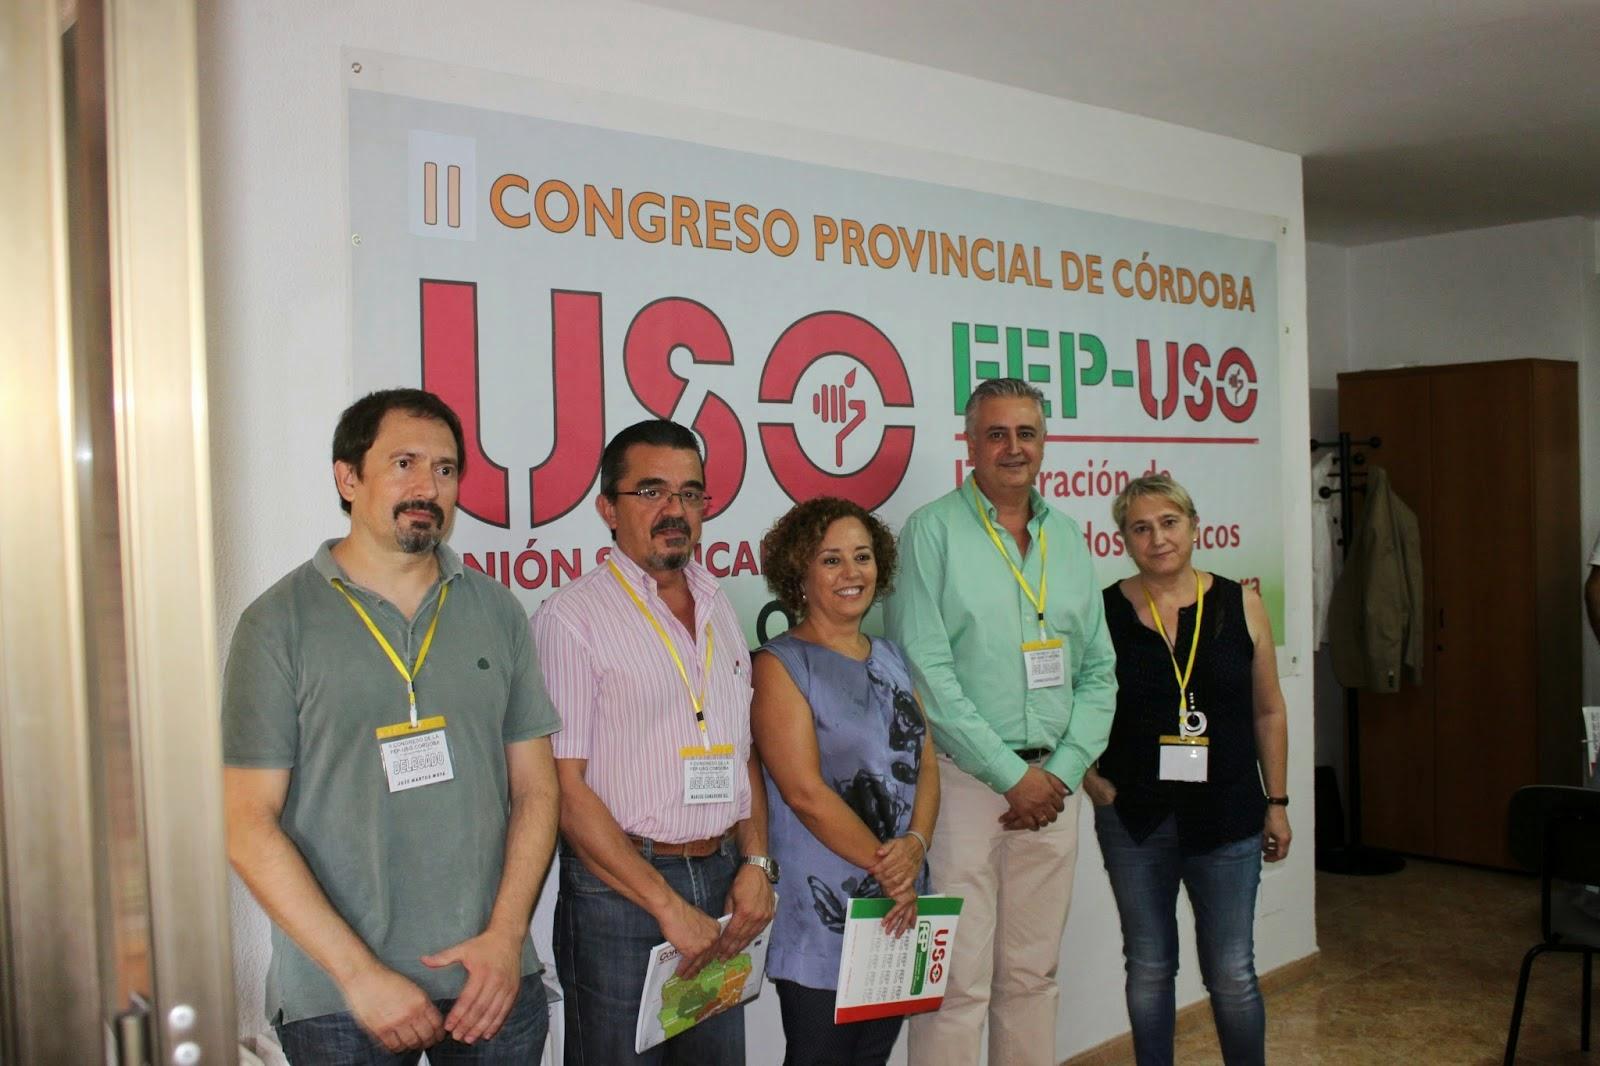 II Congreso provincial de Córdoba FEP-USO